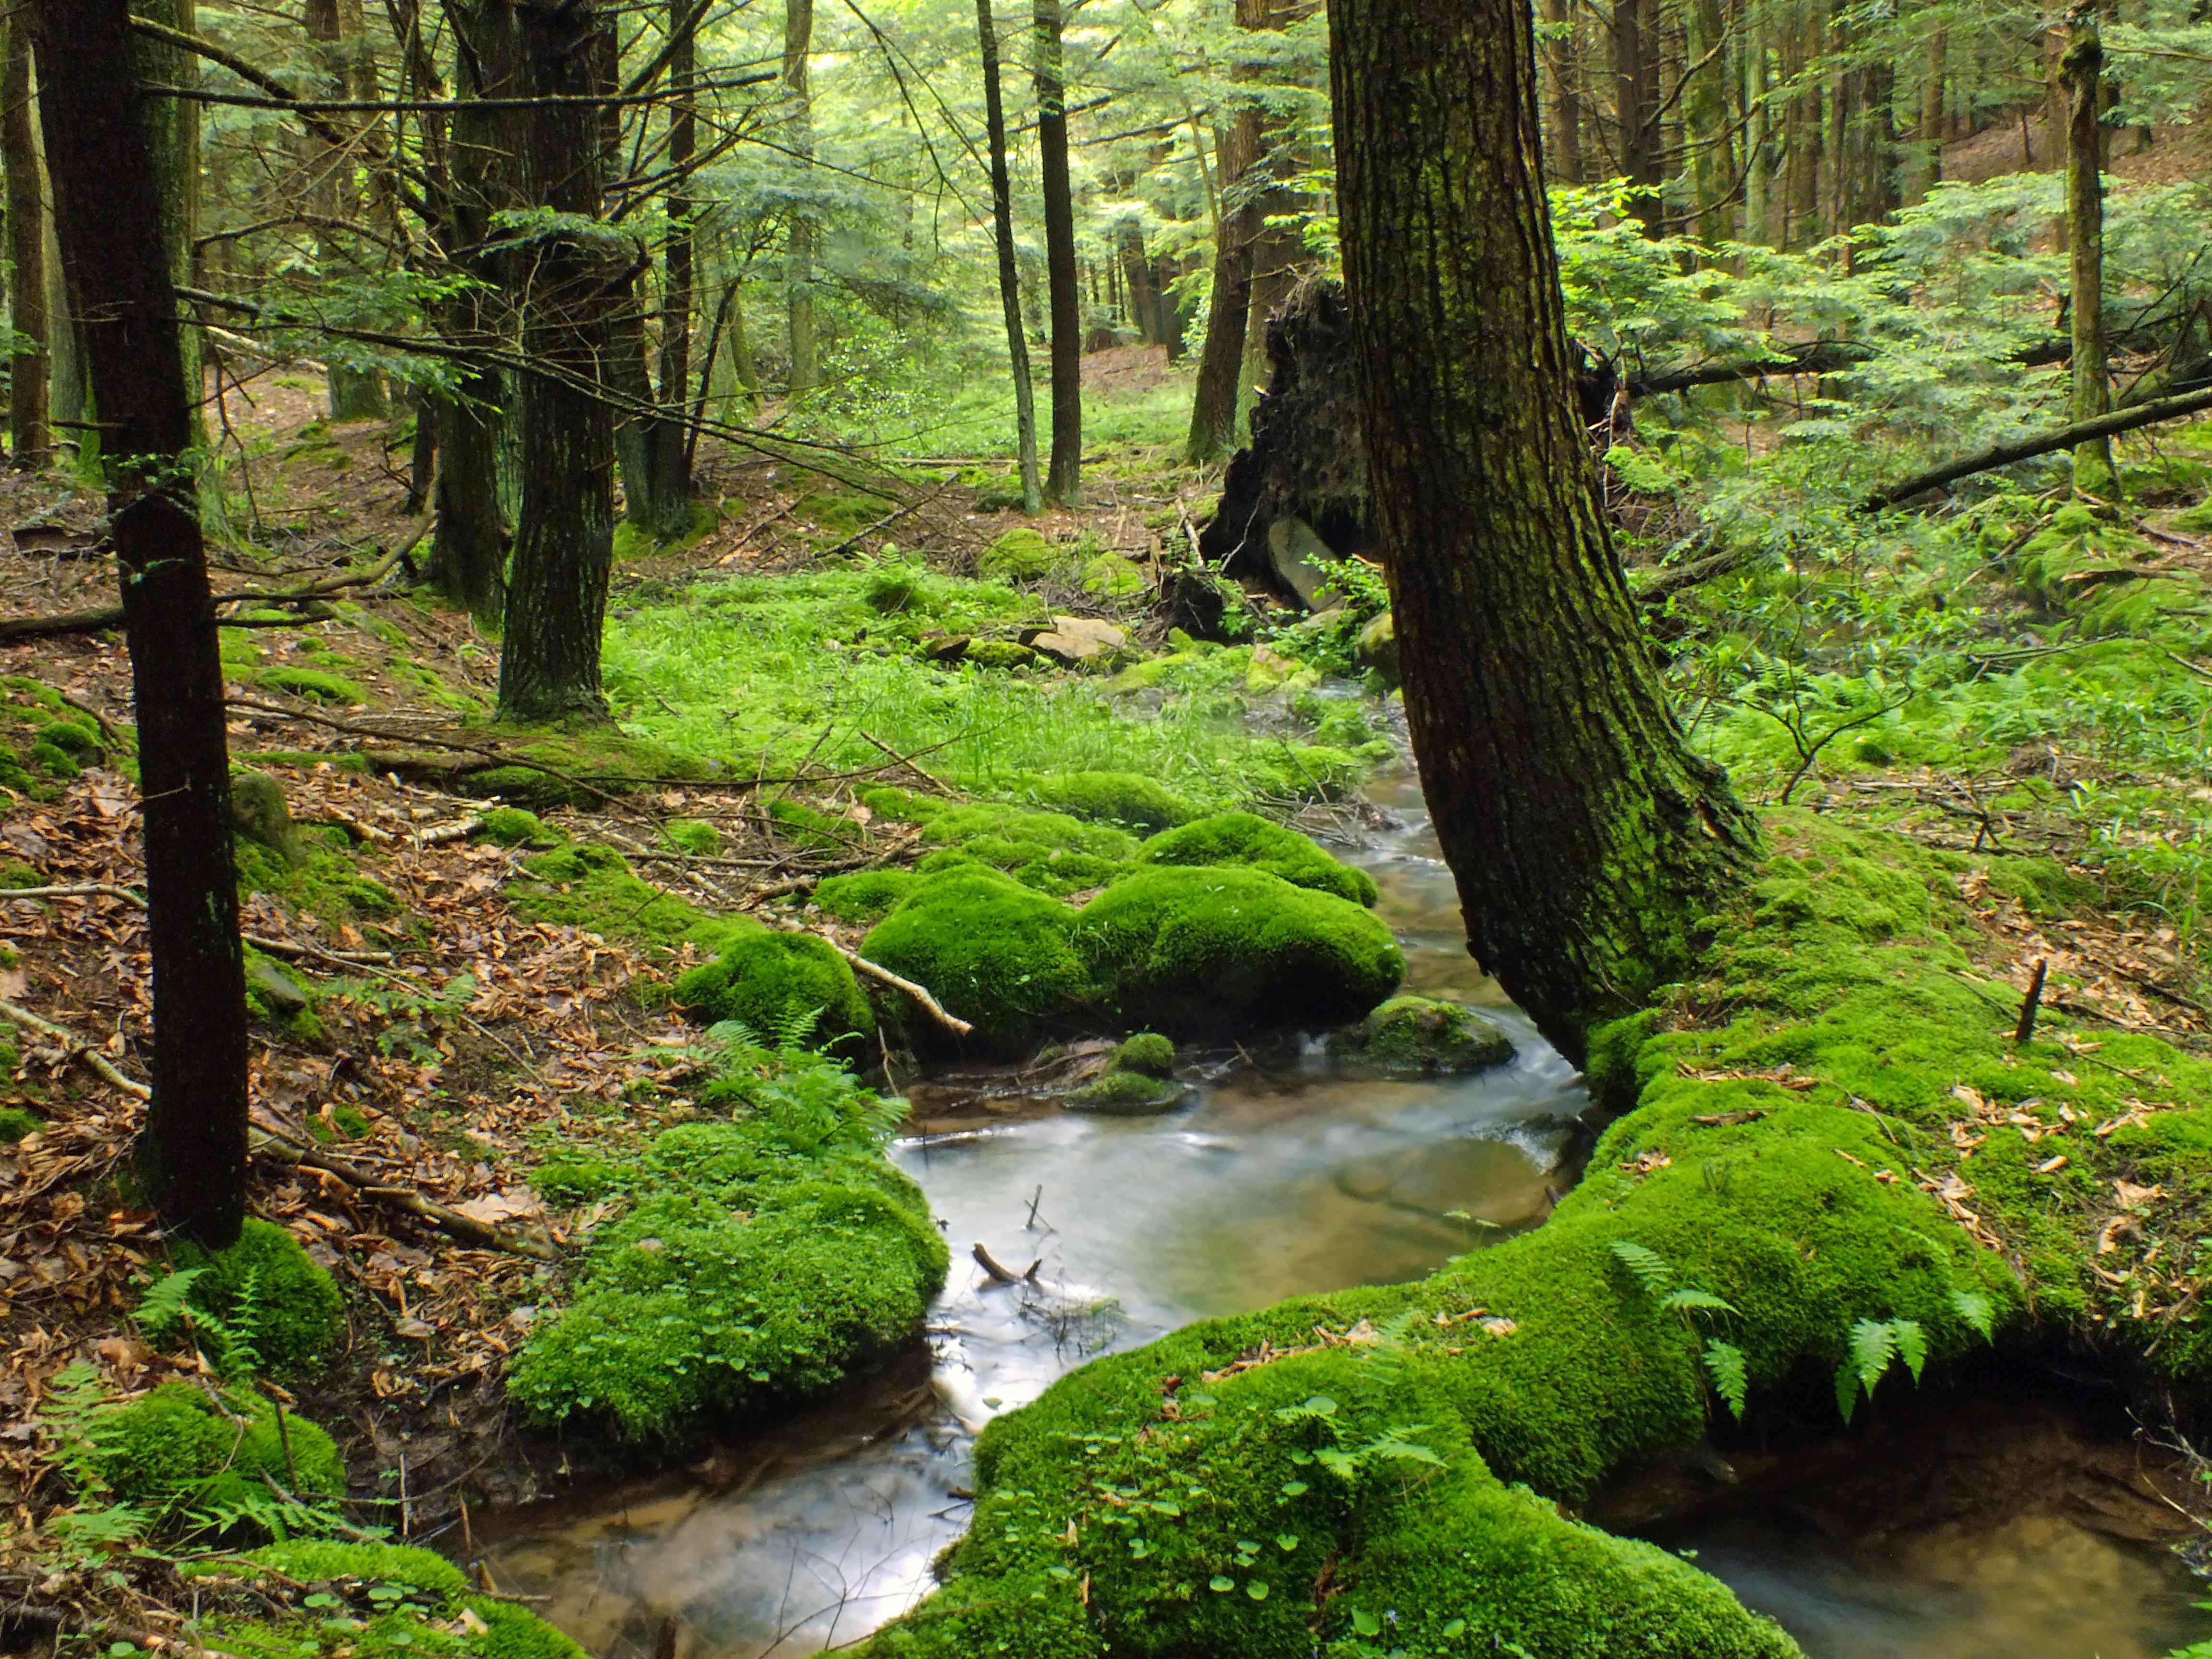 headwaters of Panther Run creek, Pennsylvania